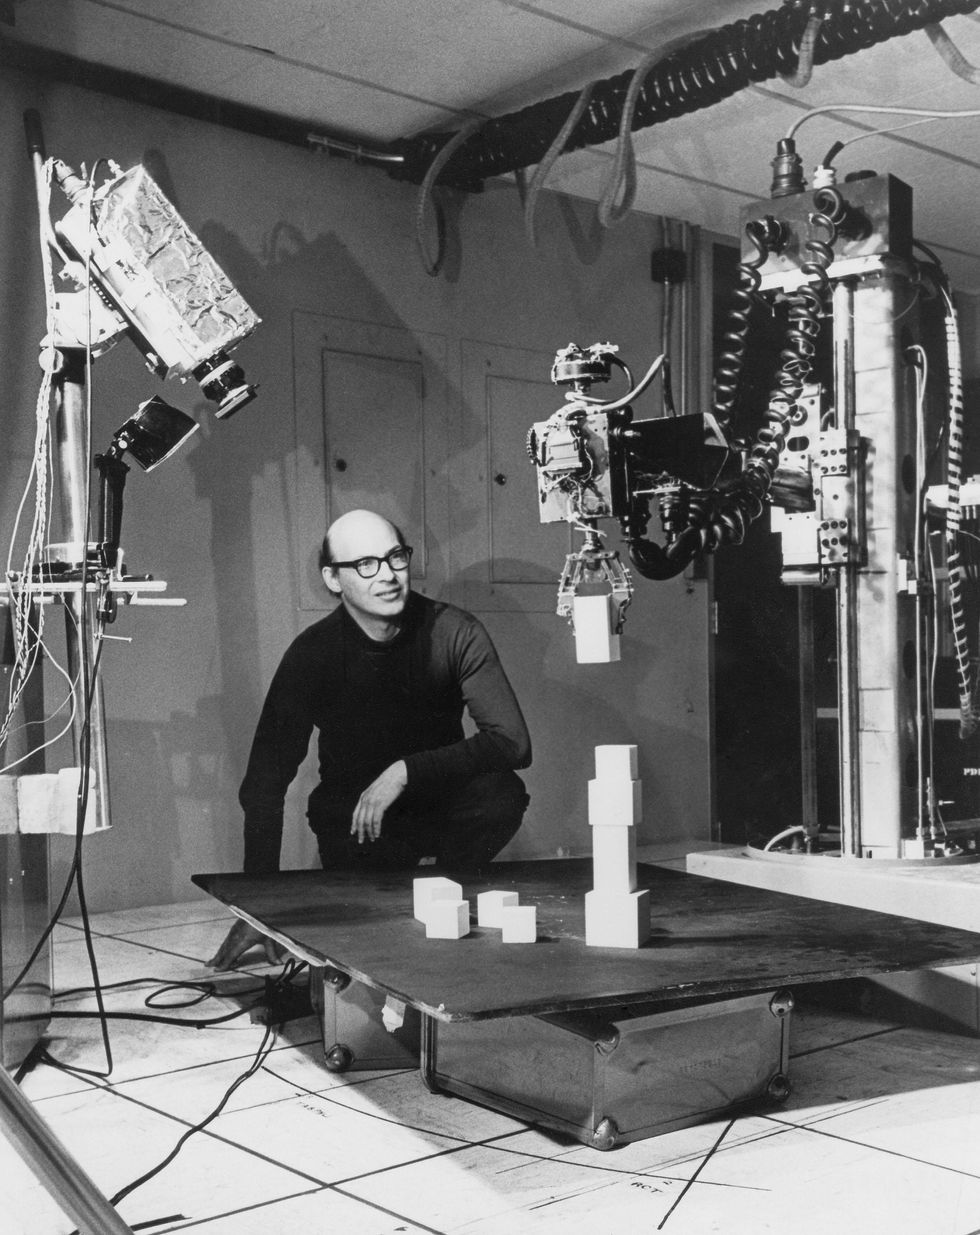 Image of MIT professor, Marvin Minsky.